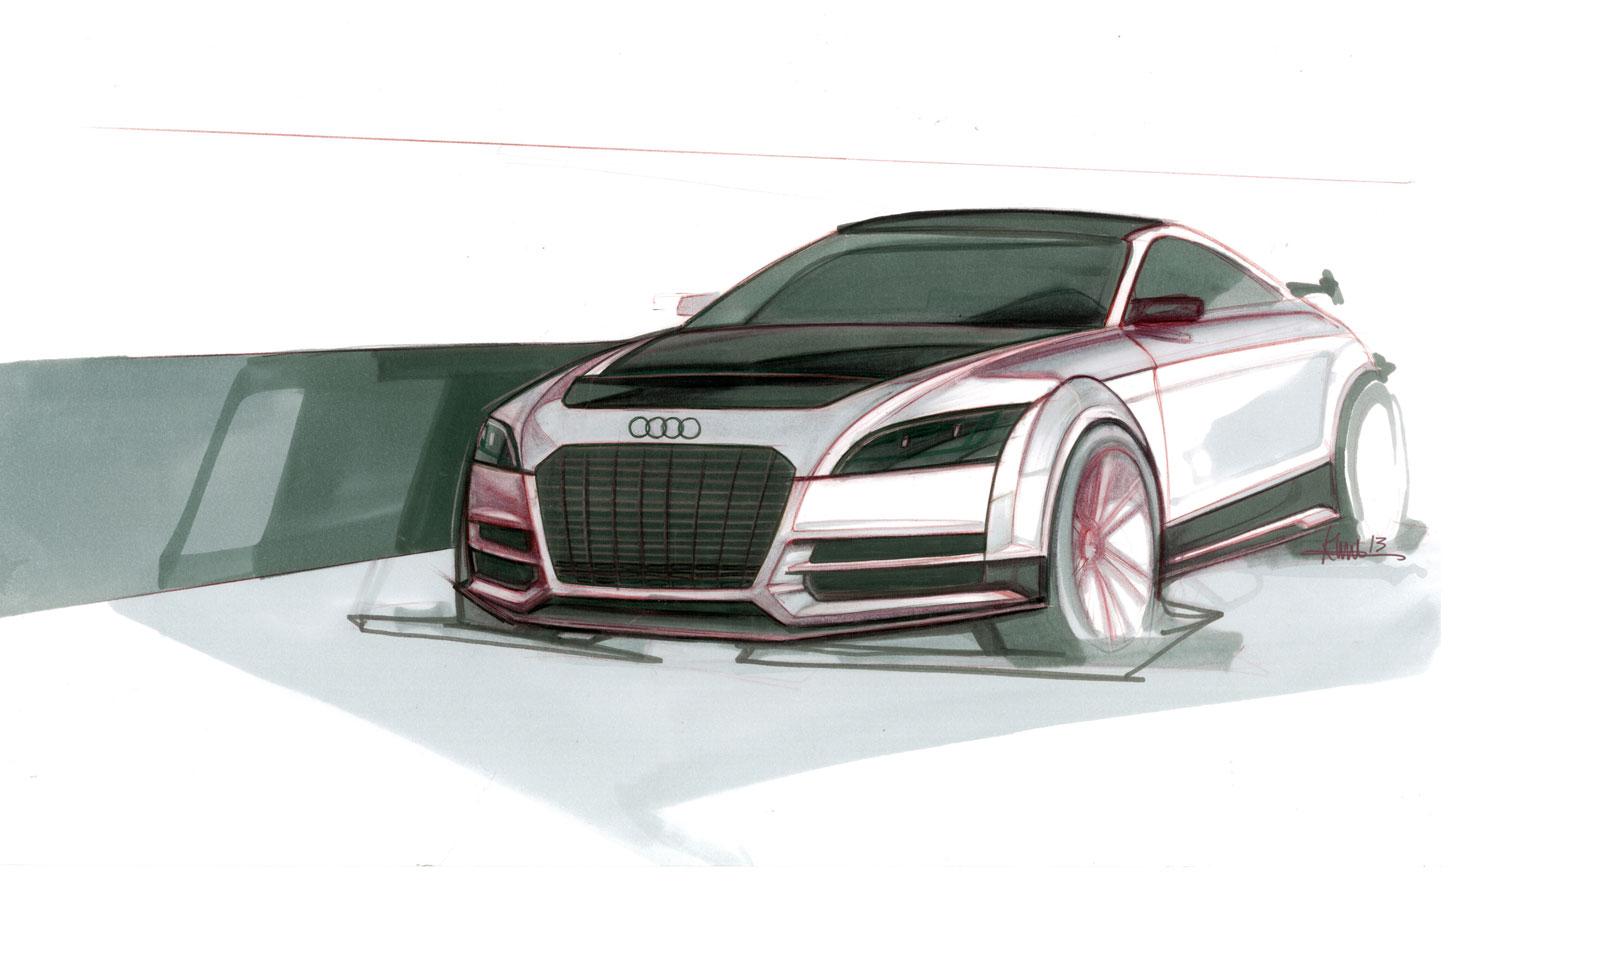 Audi Tt Ultra Quattro Concept Design Sketch Car Body Design